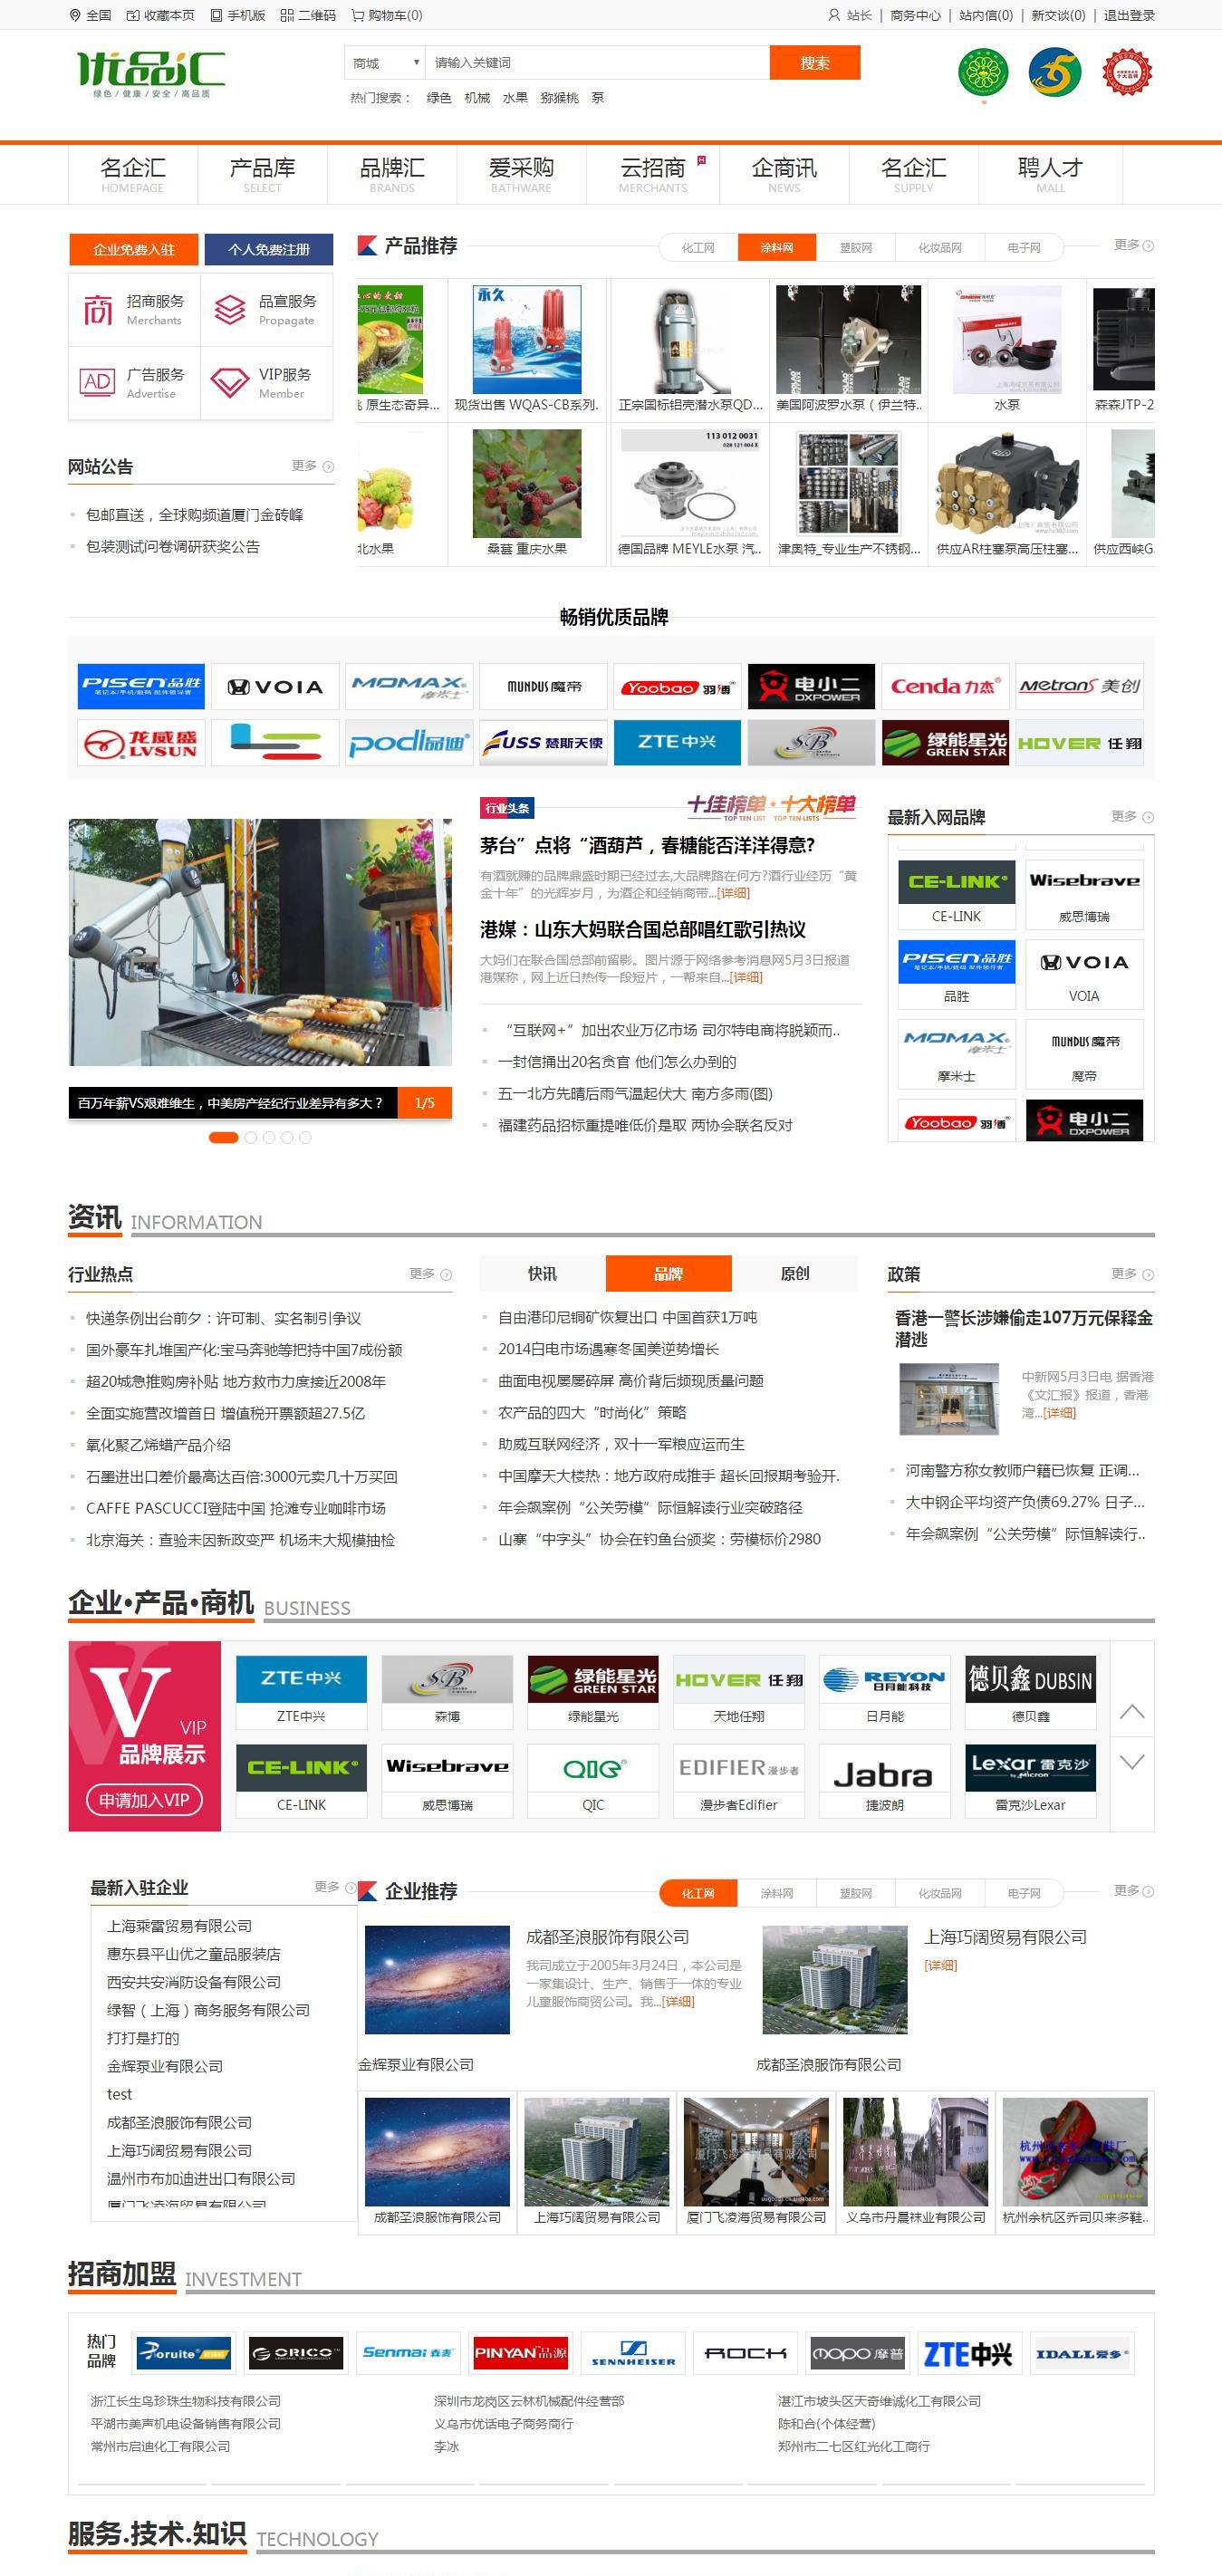 destoon行业门户招商网站模板destoon7.0模板优品汇网站源码